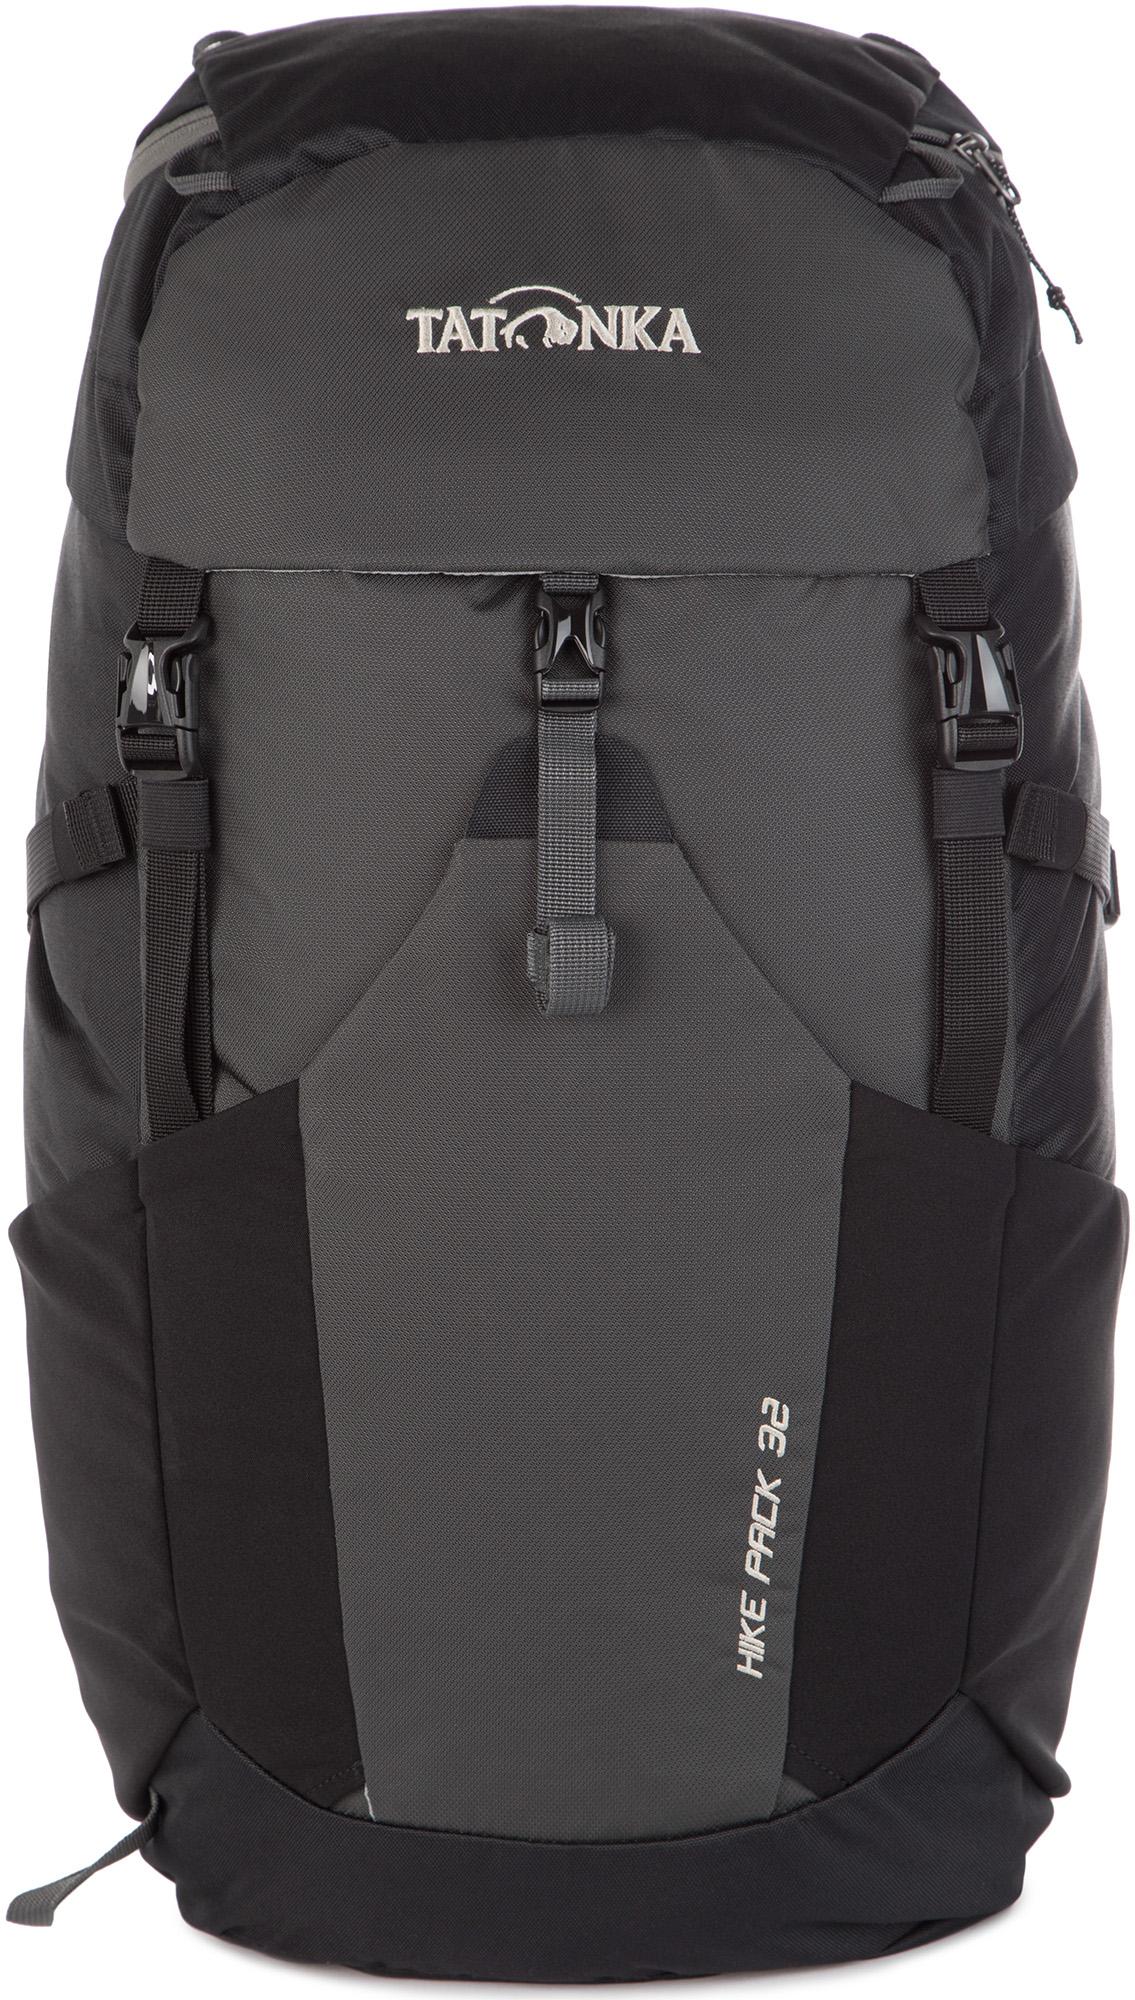 Рюкзак Tatonka Hike Pack 32 недорого